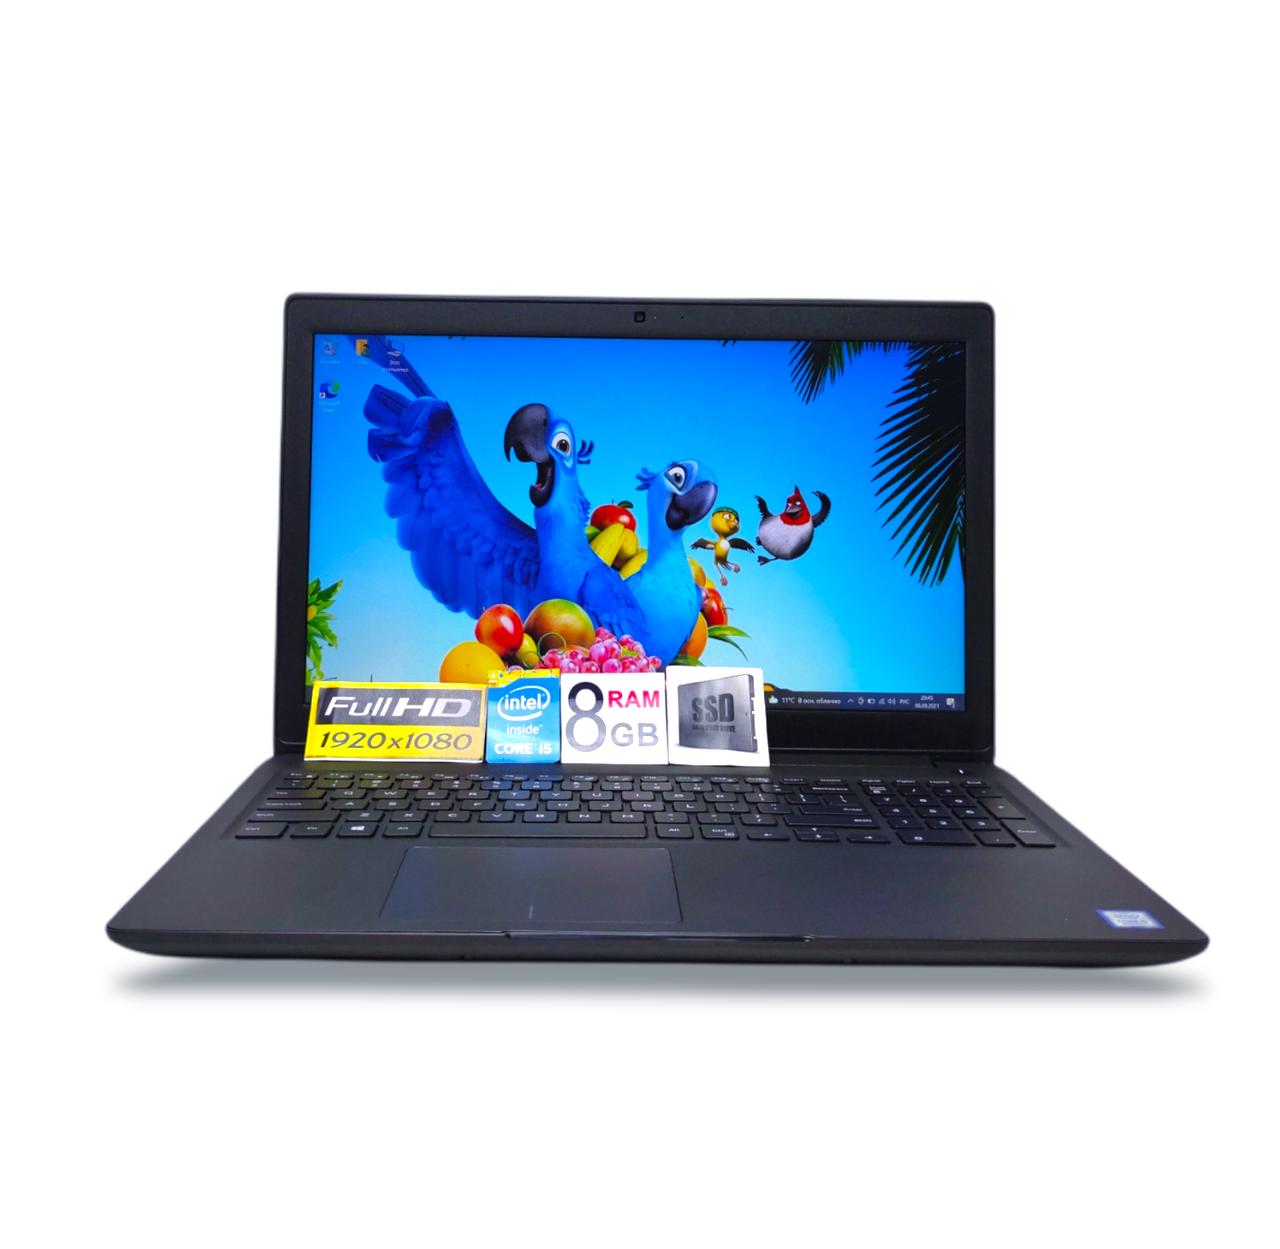 Бізнес ноутбук Dell Latitude 3500  FHD 1920x1080 Core i5 8265U 8GB SSD256GB